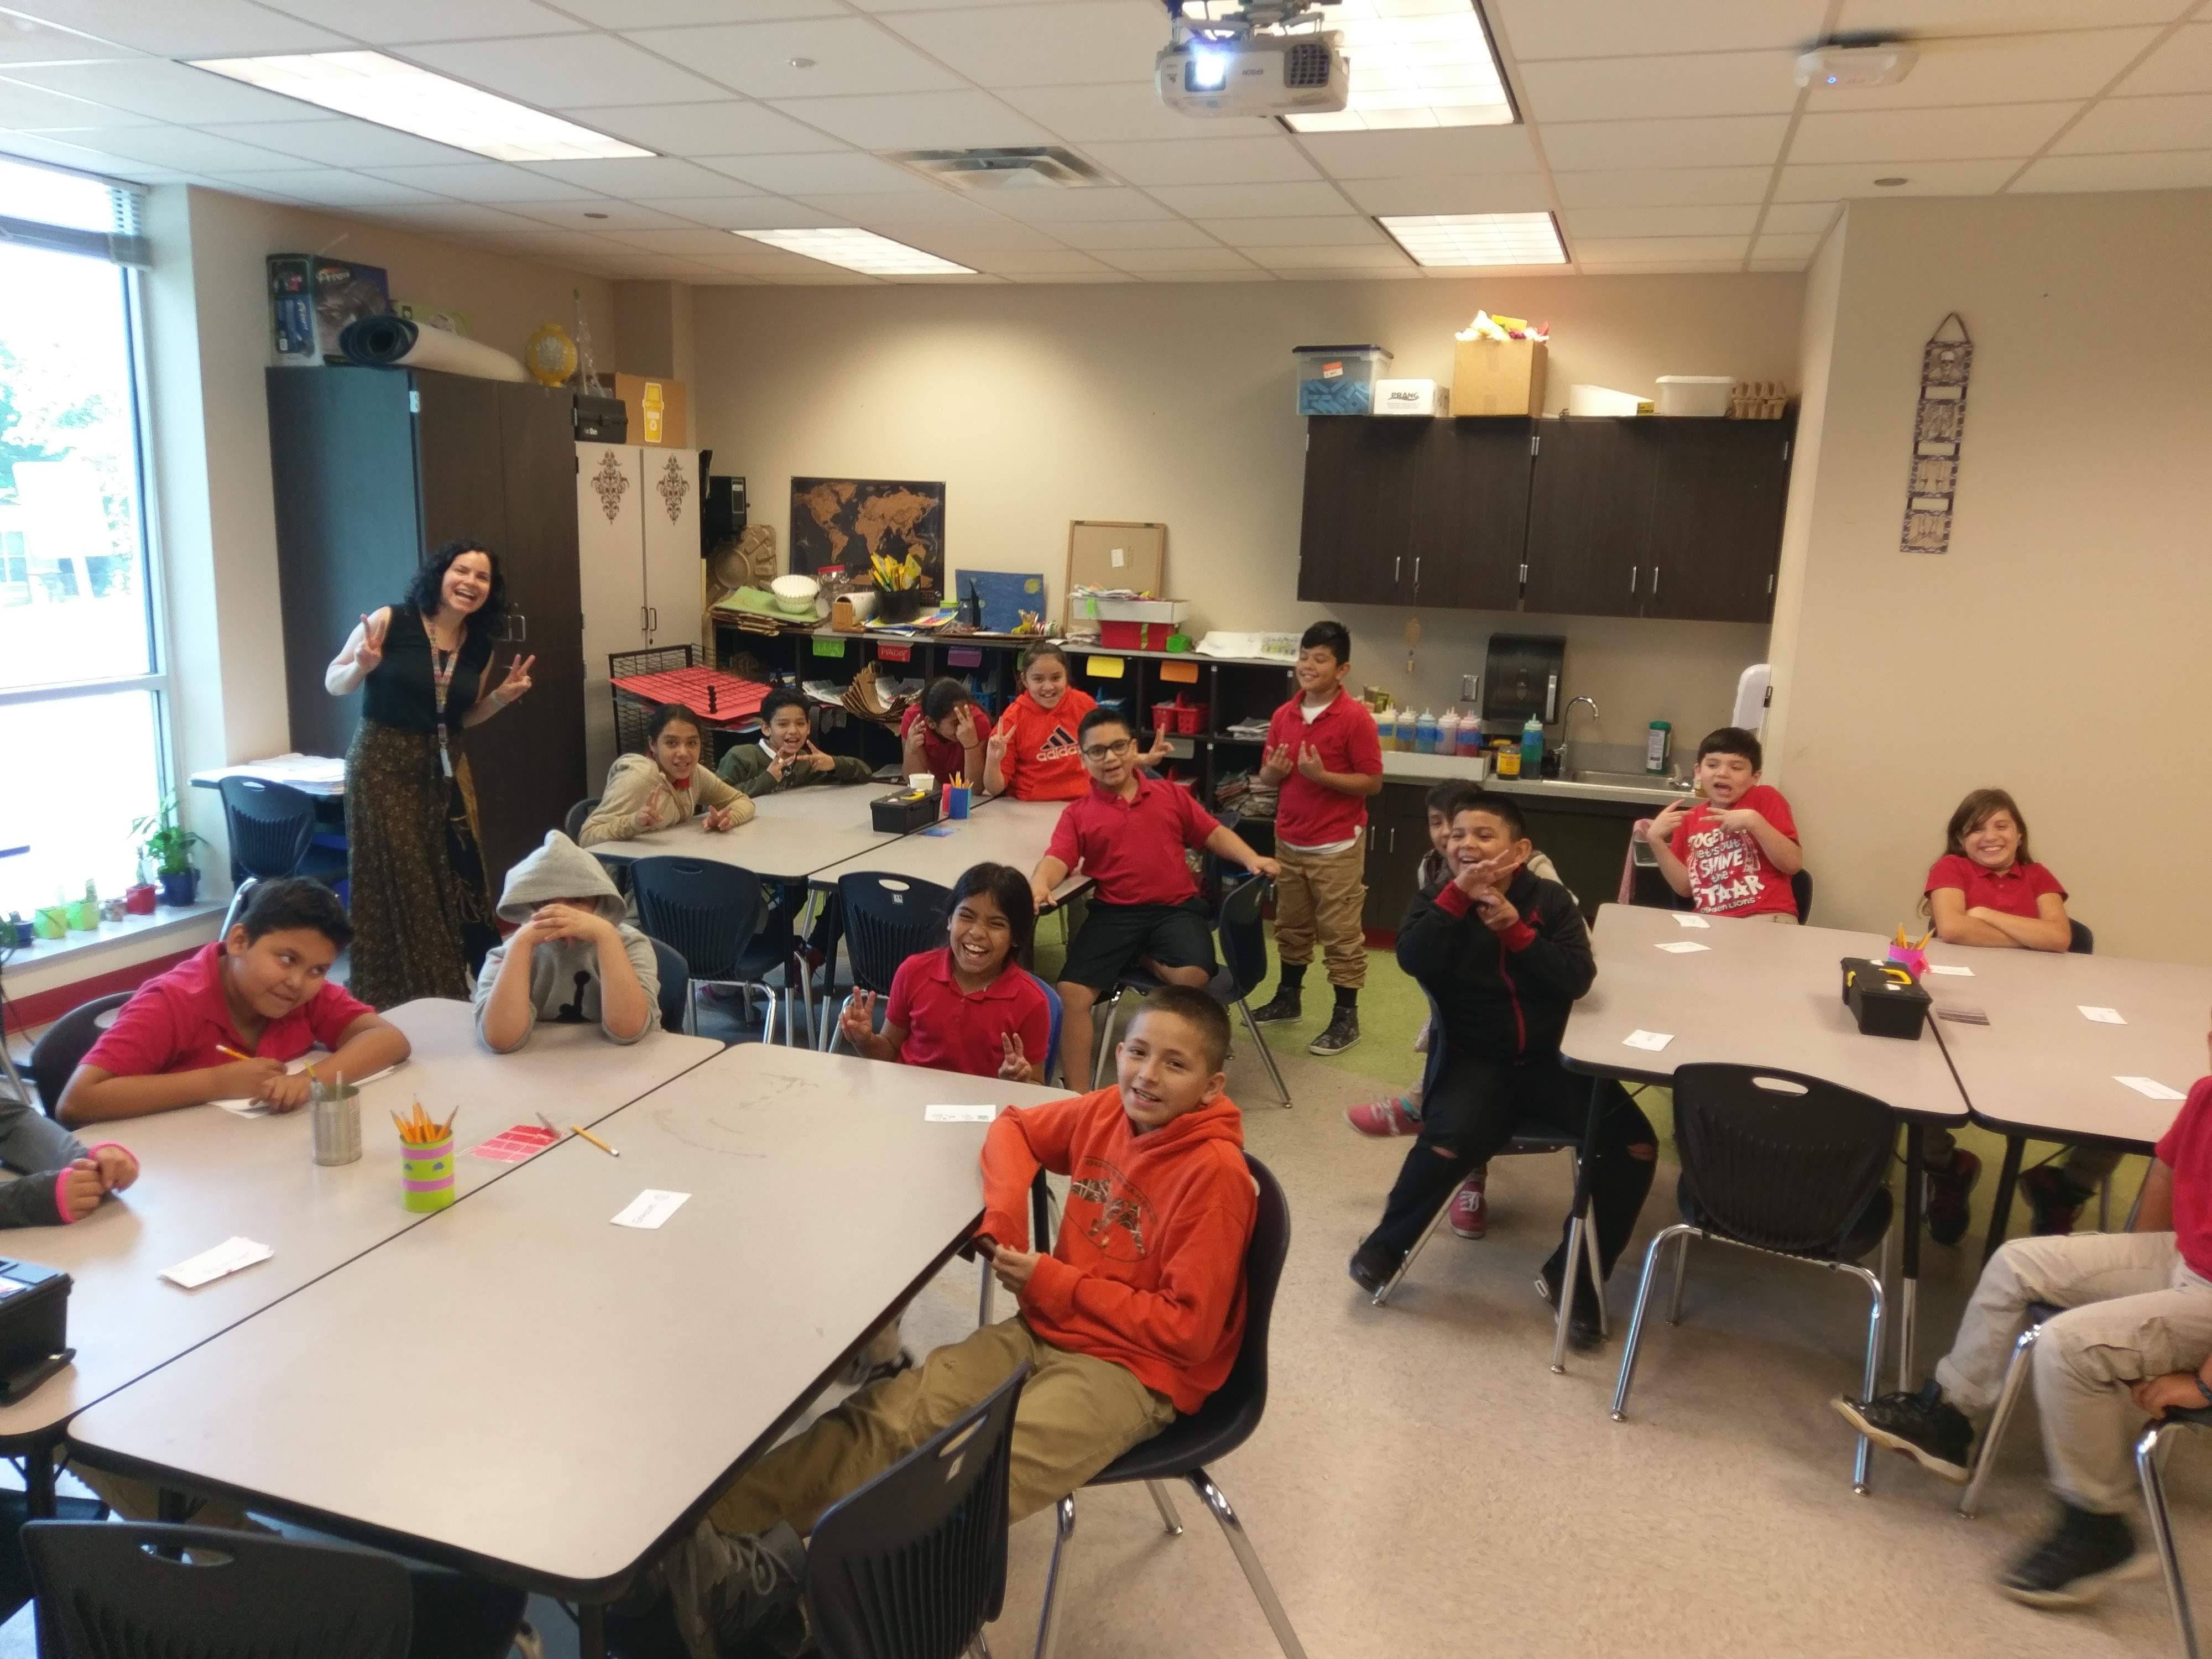 School Visit at Ogden Elementary, San Antonio, TX